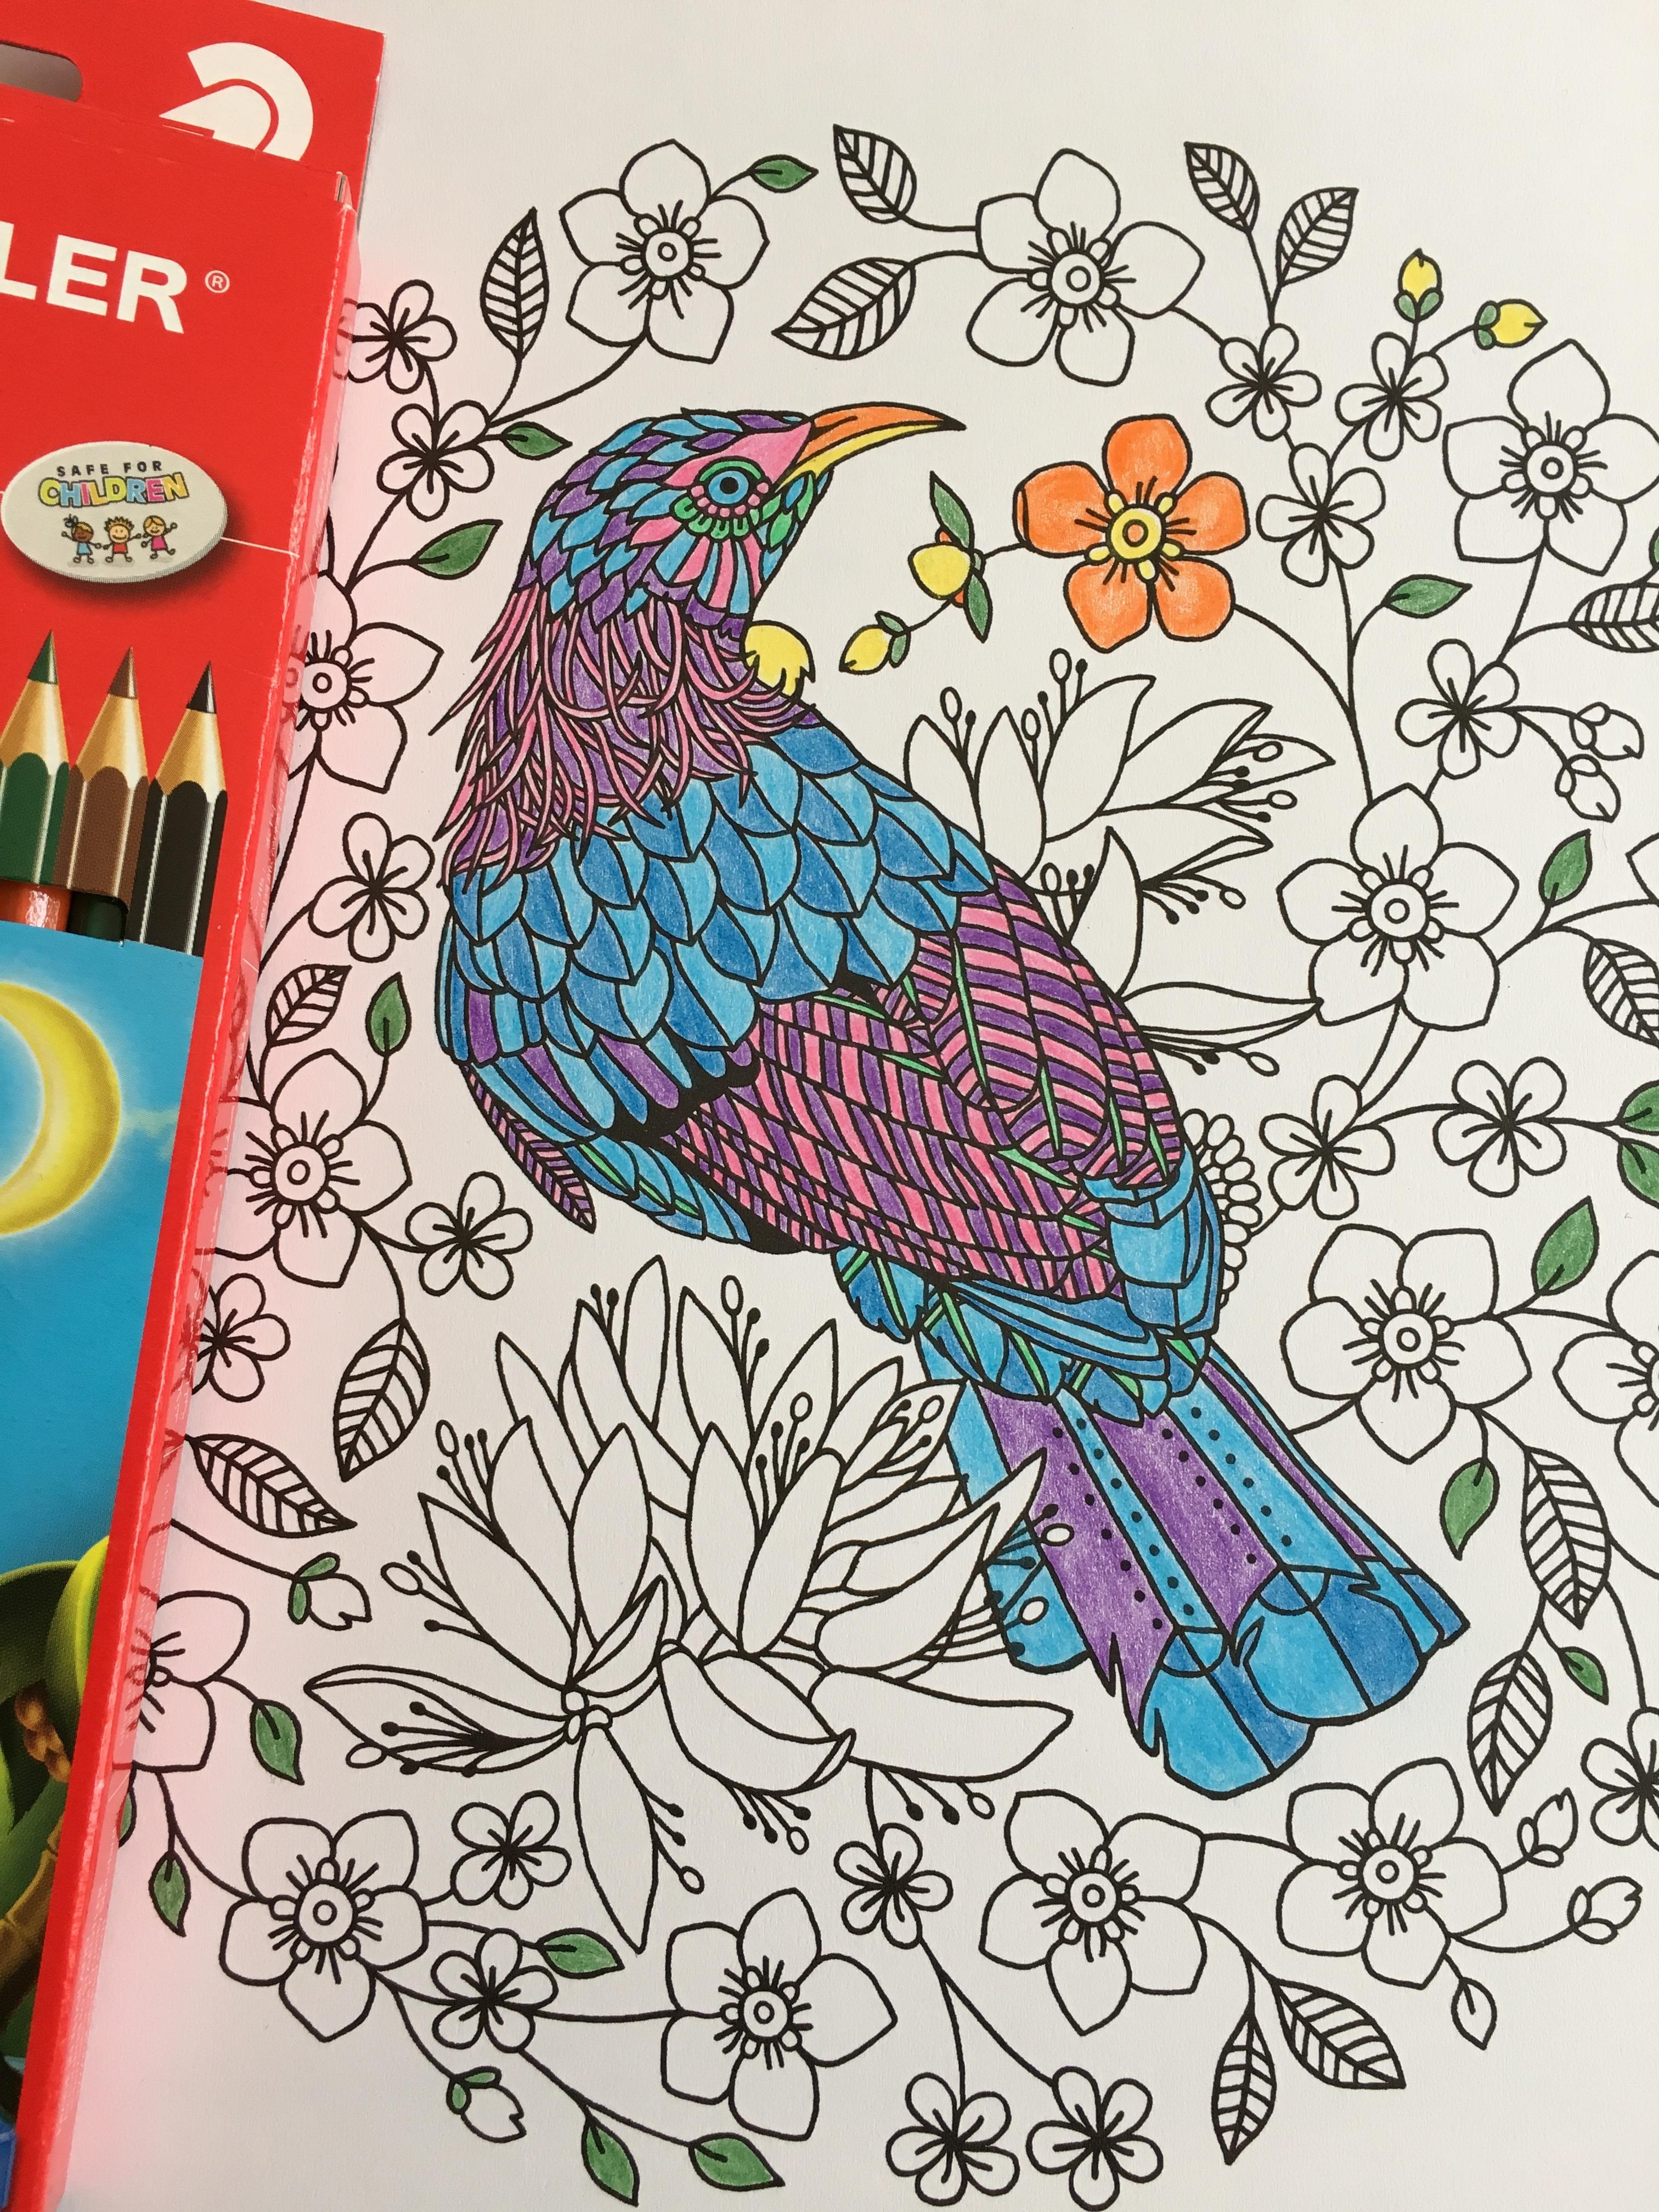 pensil kreatif burung ungu pola bersantai warna artistik biru warna warni warna warna seni sketsa